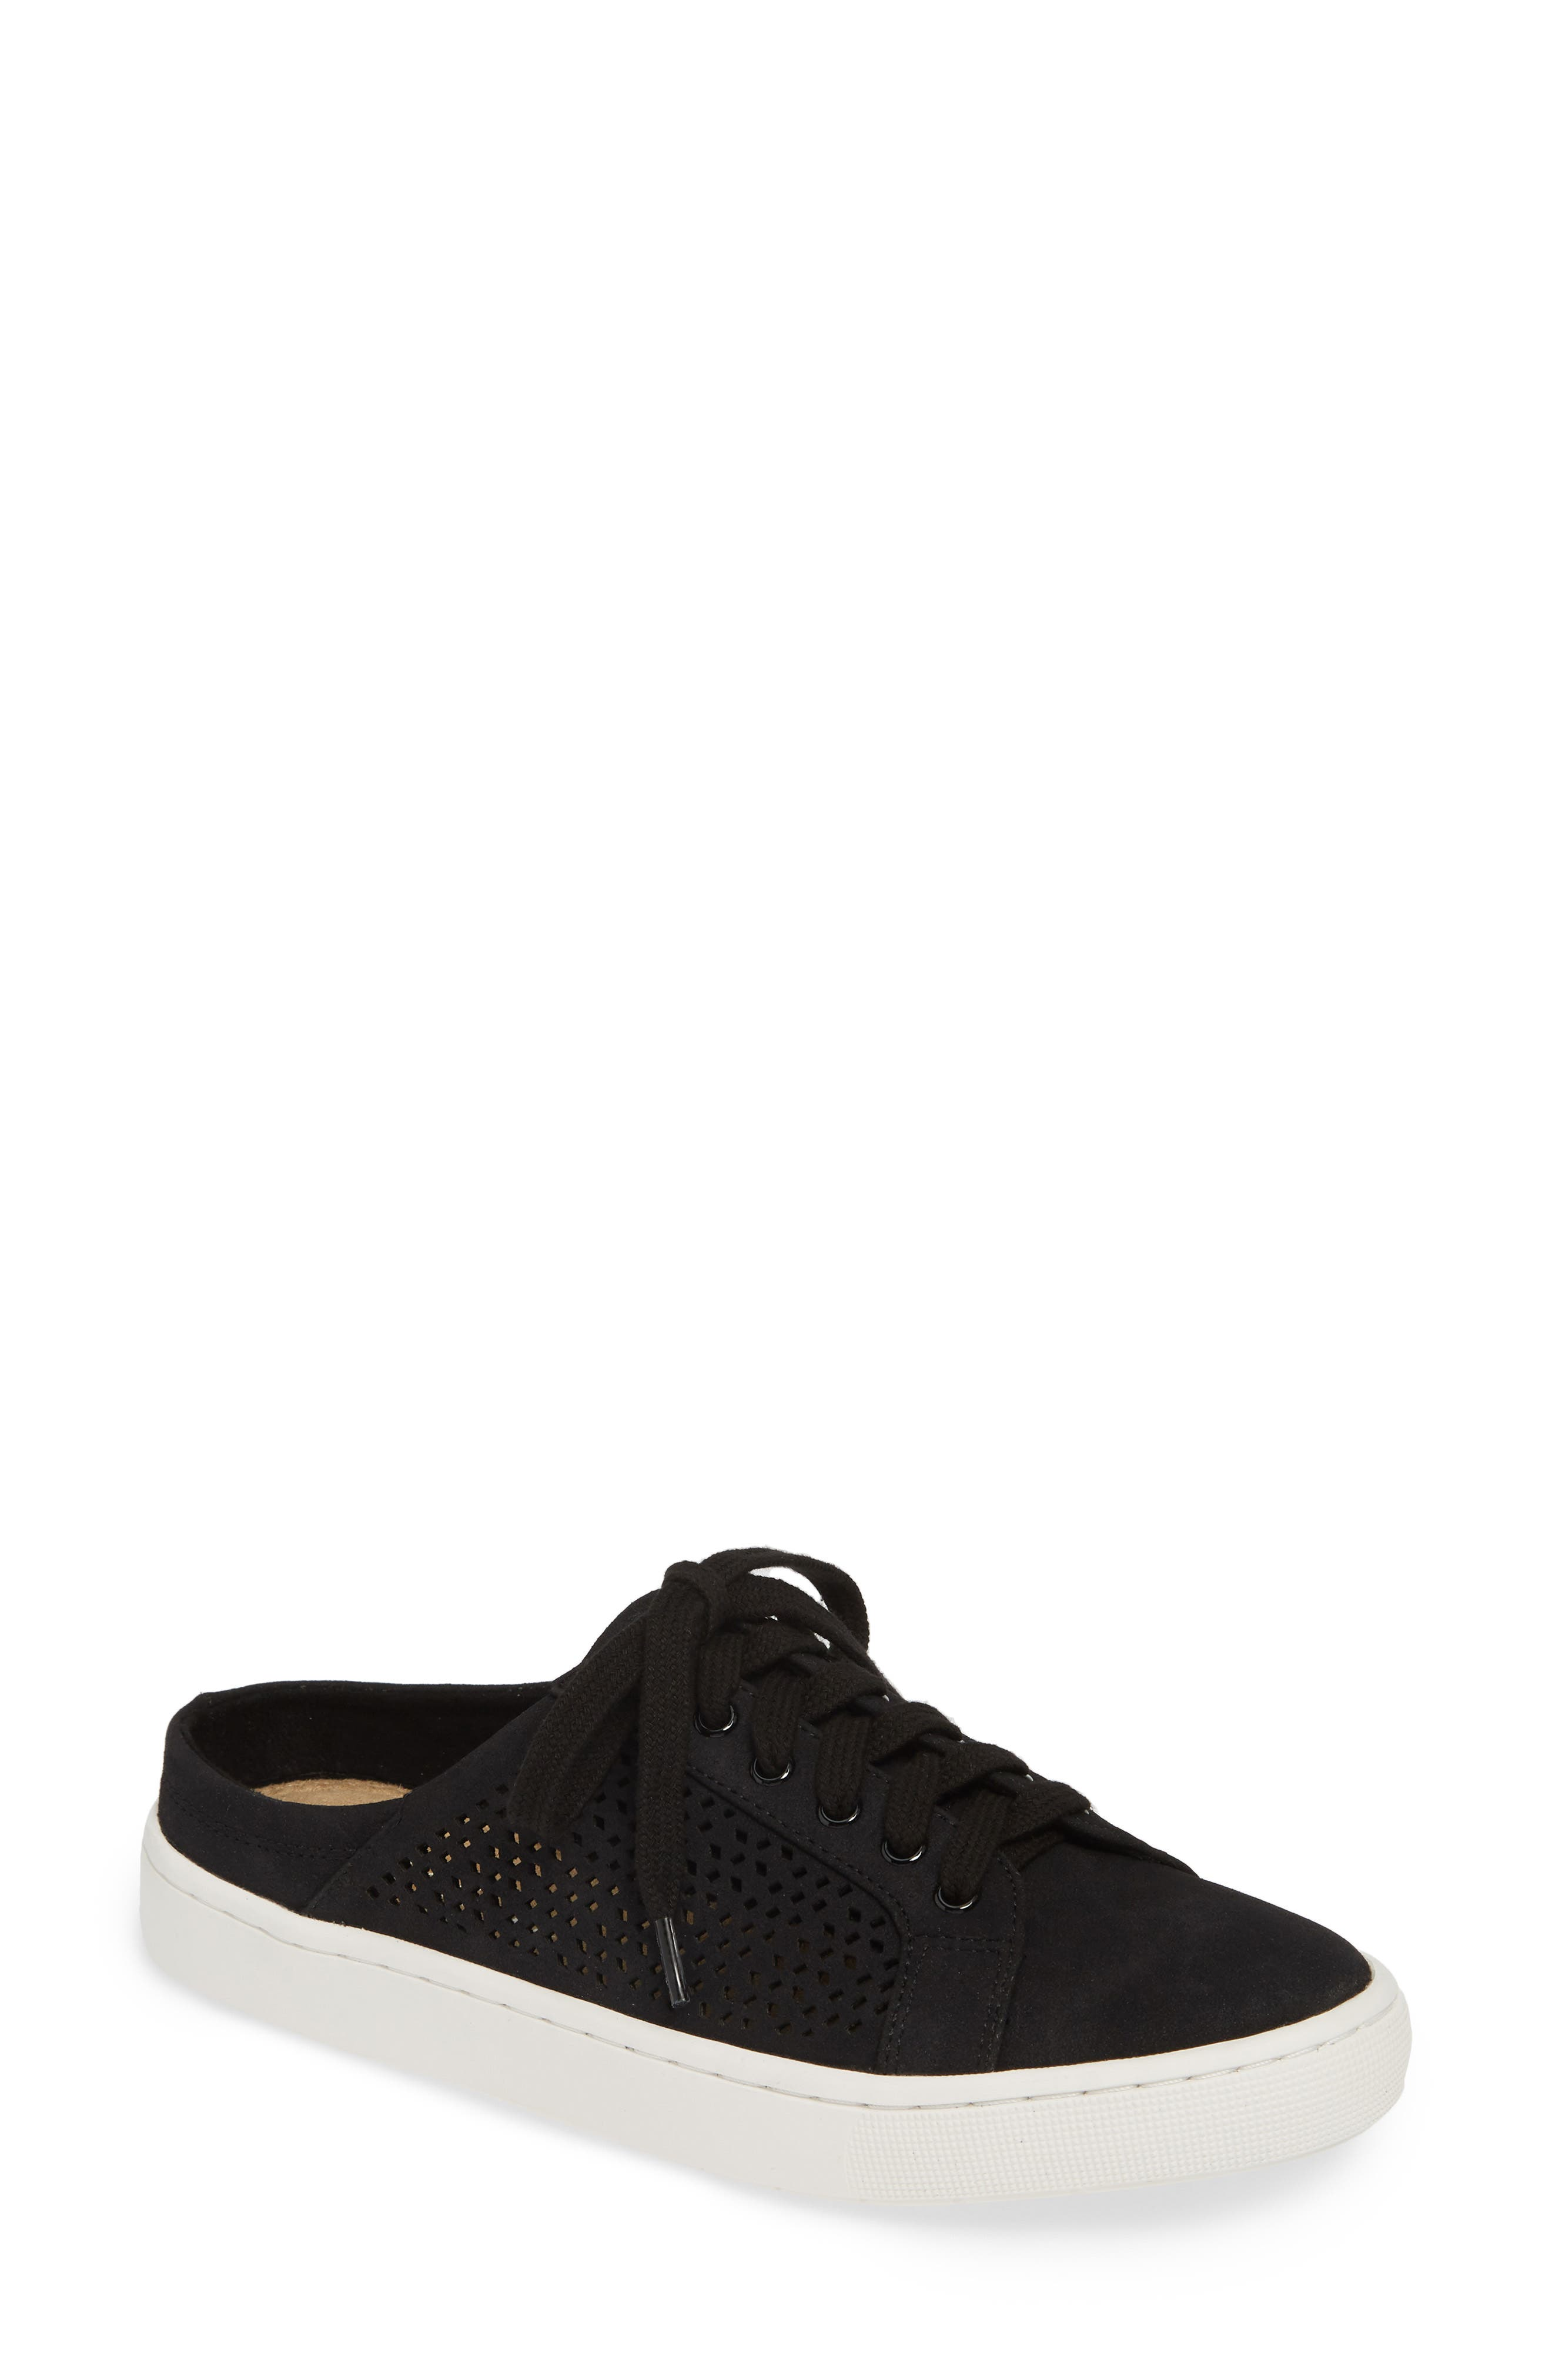 Bella Vita Star Open Back Sneaker, Black